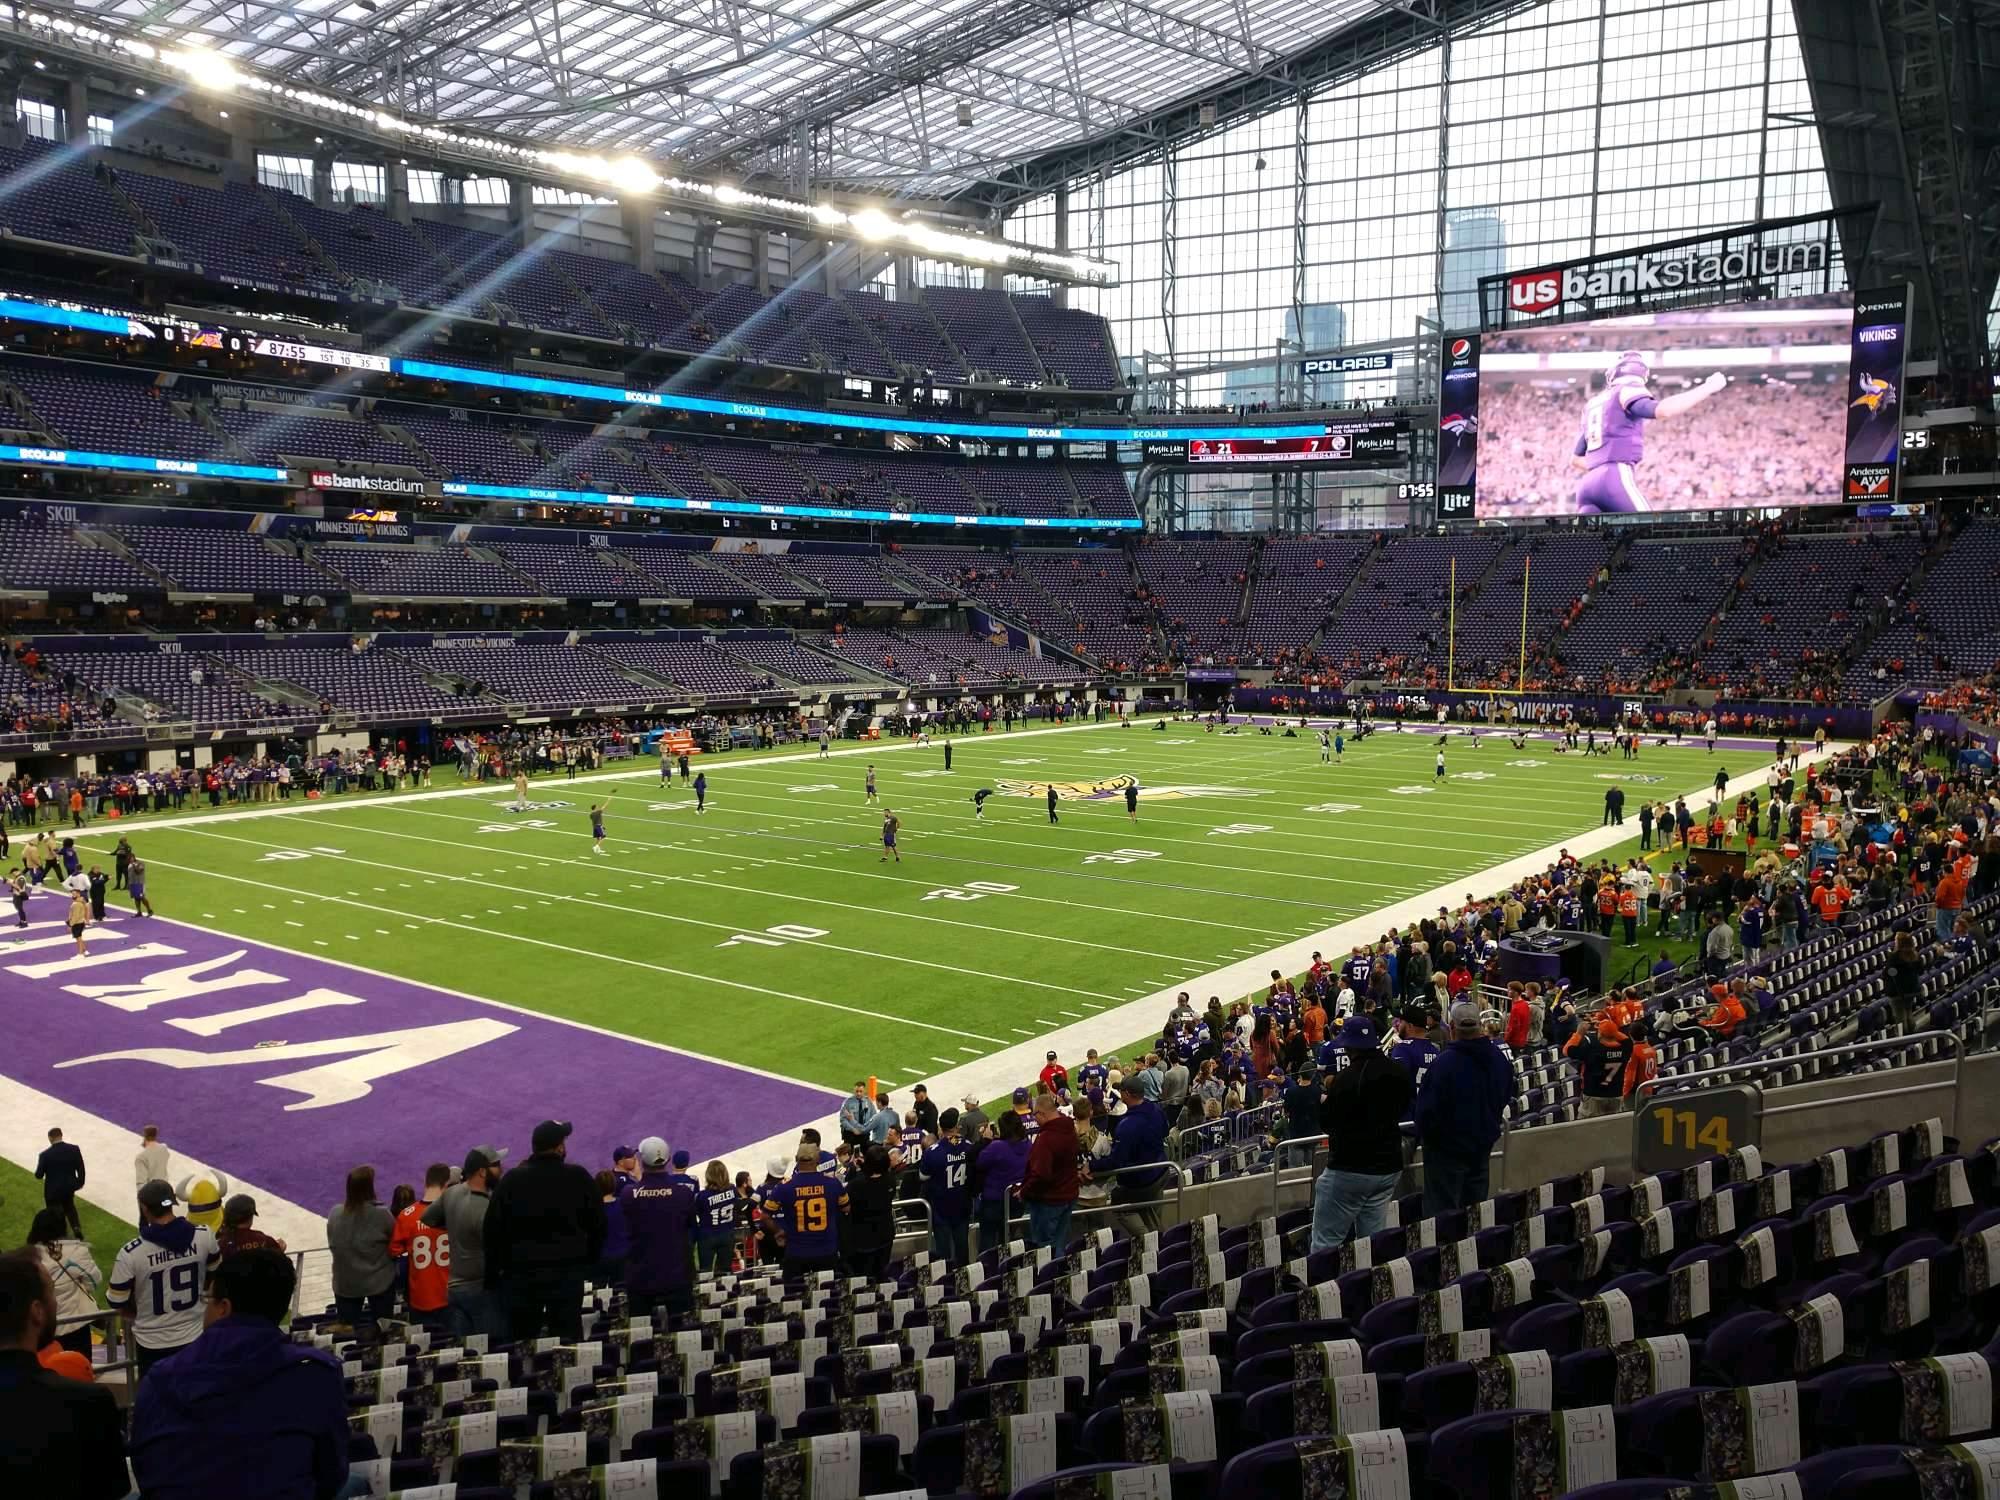 U.S. Bank Stadium Section 114 Row 19 Seat 22